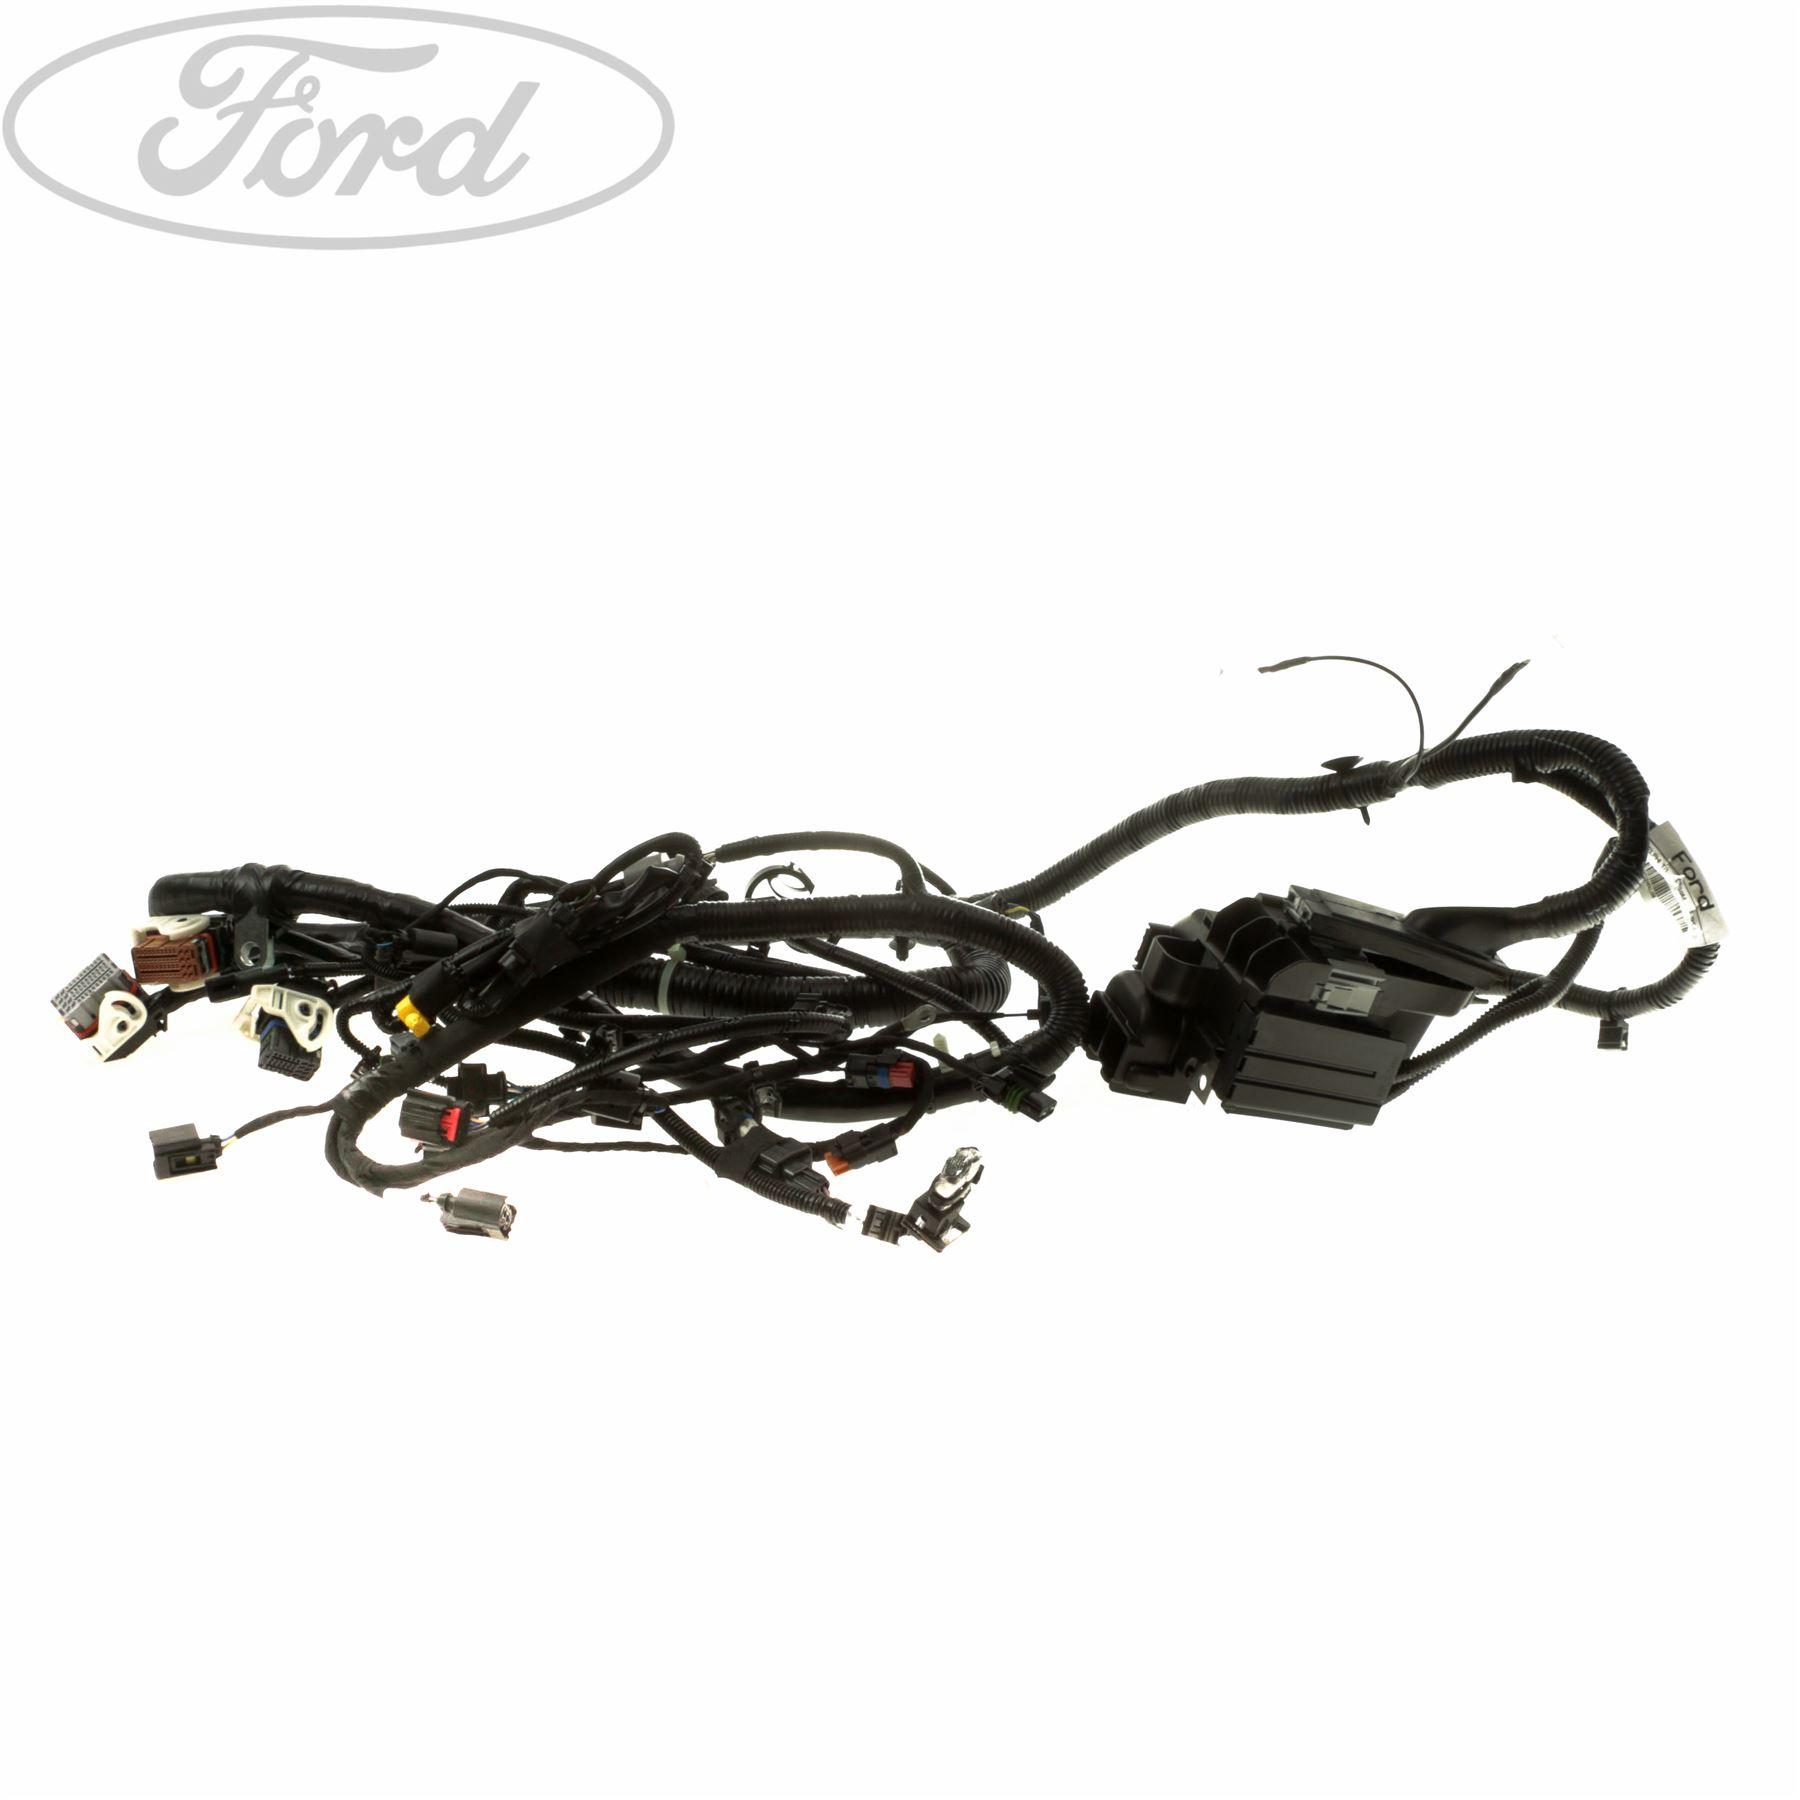 Genuine Ford S-Max Mondeo MK4 Galaxy Engine Transmission